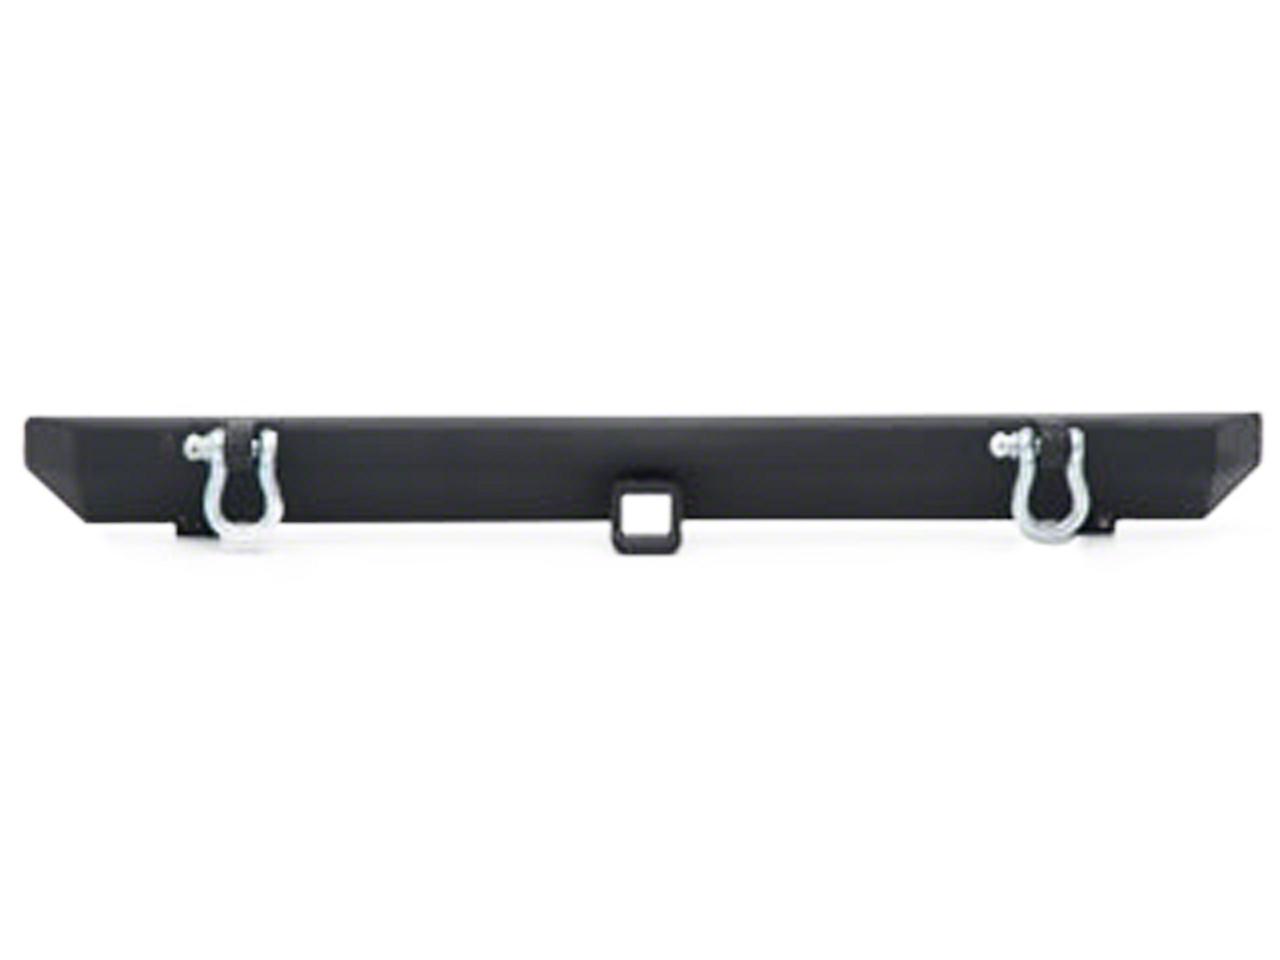 Smittybilt SRC Rear Bumper w/ D-Rings - Textured Black (87-06 Wrangler YJ & TJ)